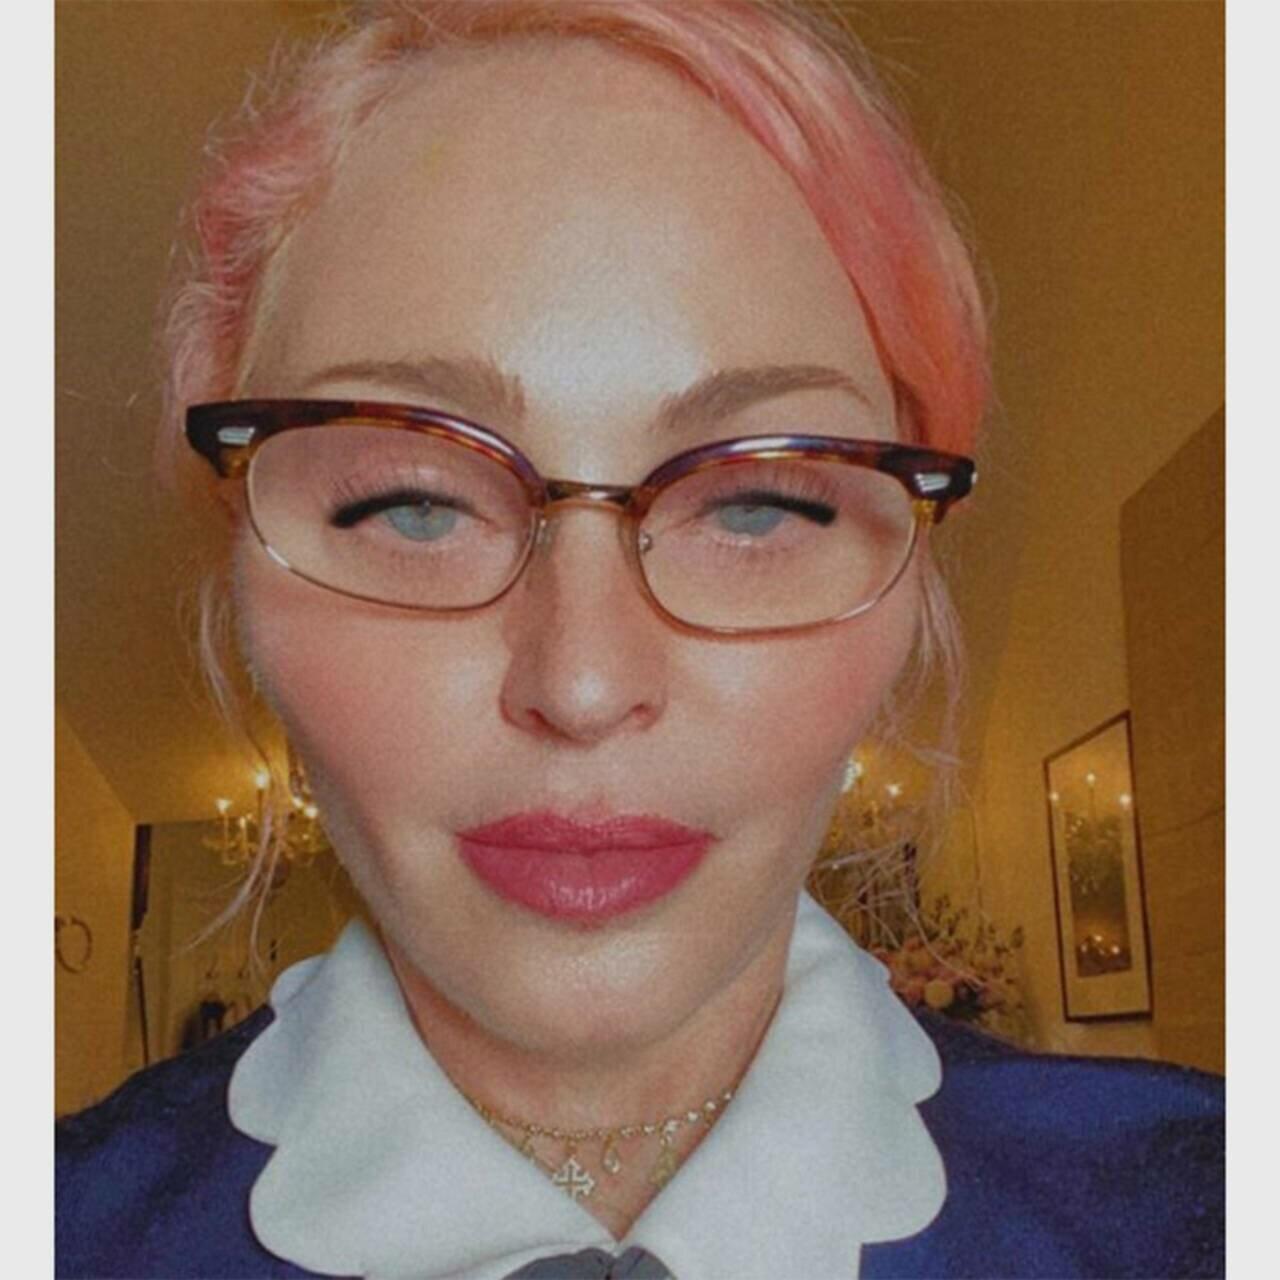 Мадонна в свои 63 года